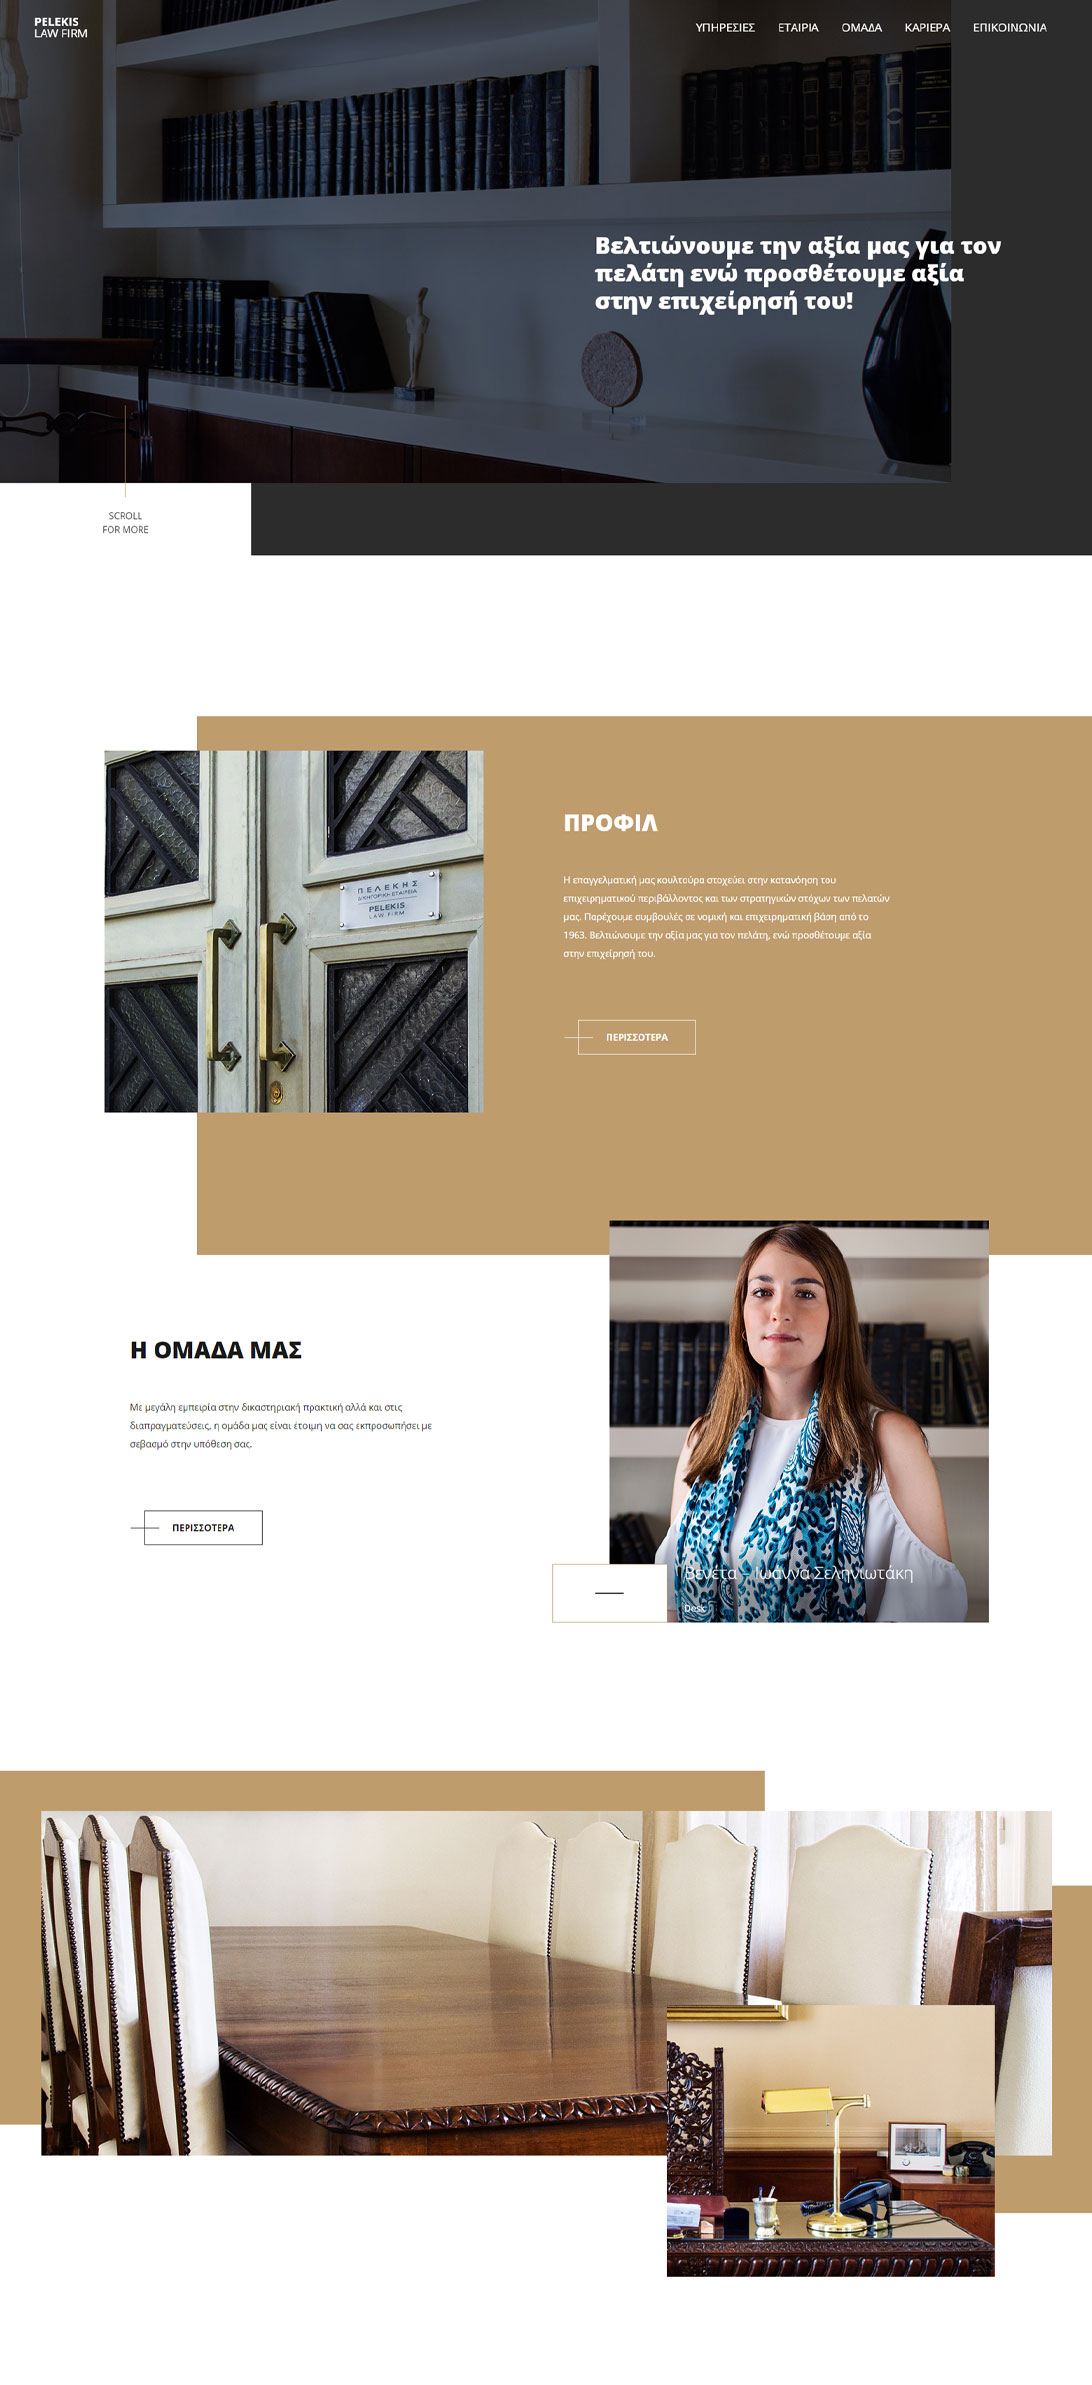 Pelekis Law Firm homepage fullscreen